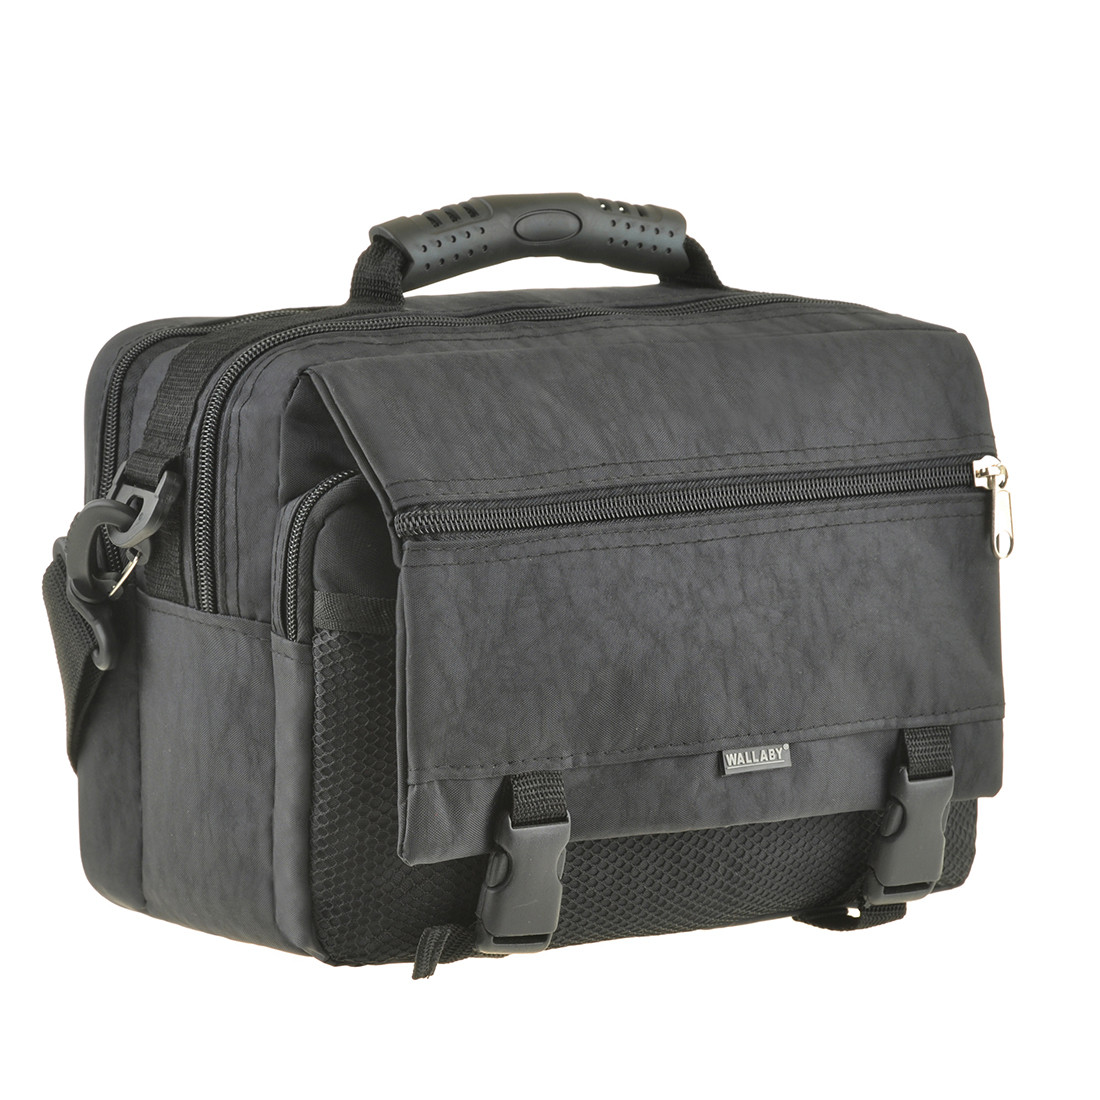 Мужская сумка горизонтальная Wallaby 30х23х17  цвет чёрный, ткань «Кордура»  в2425ч